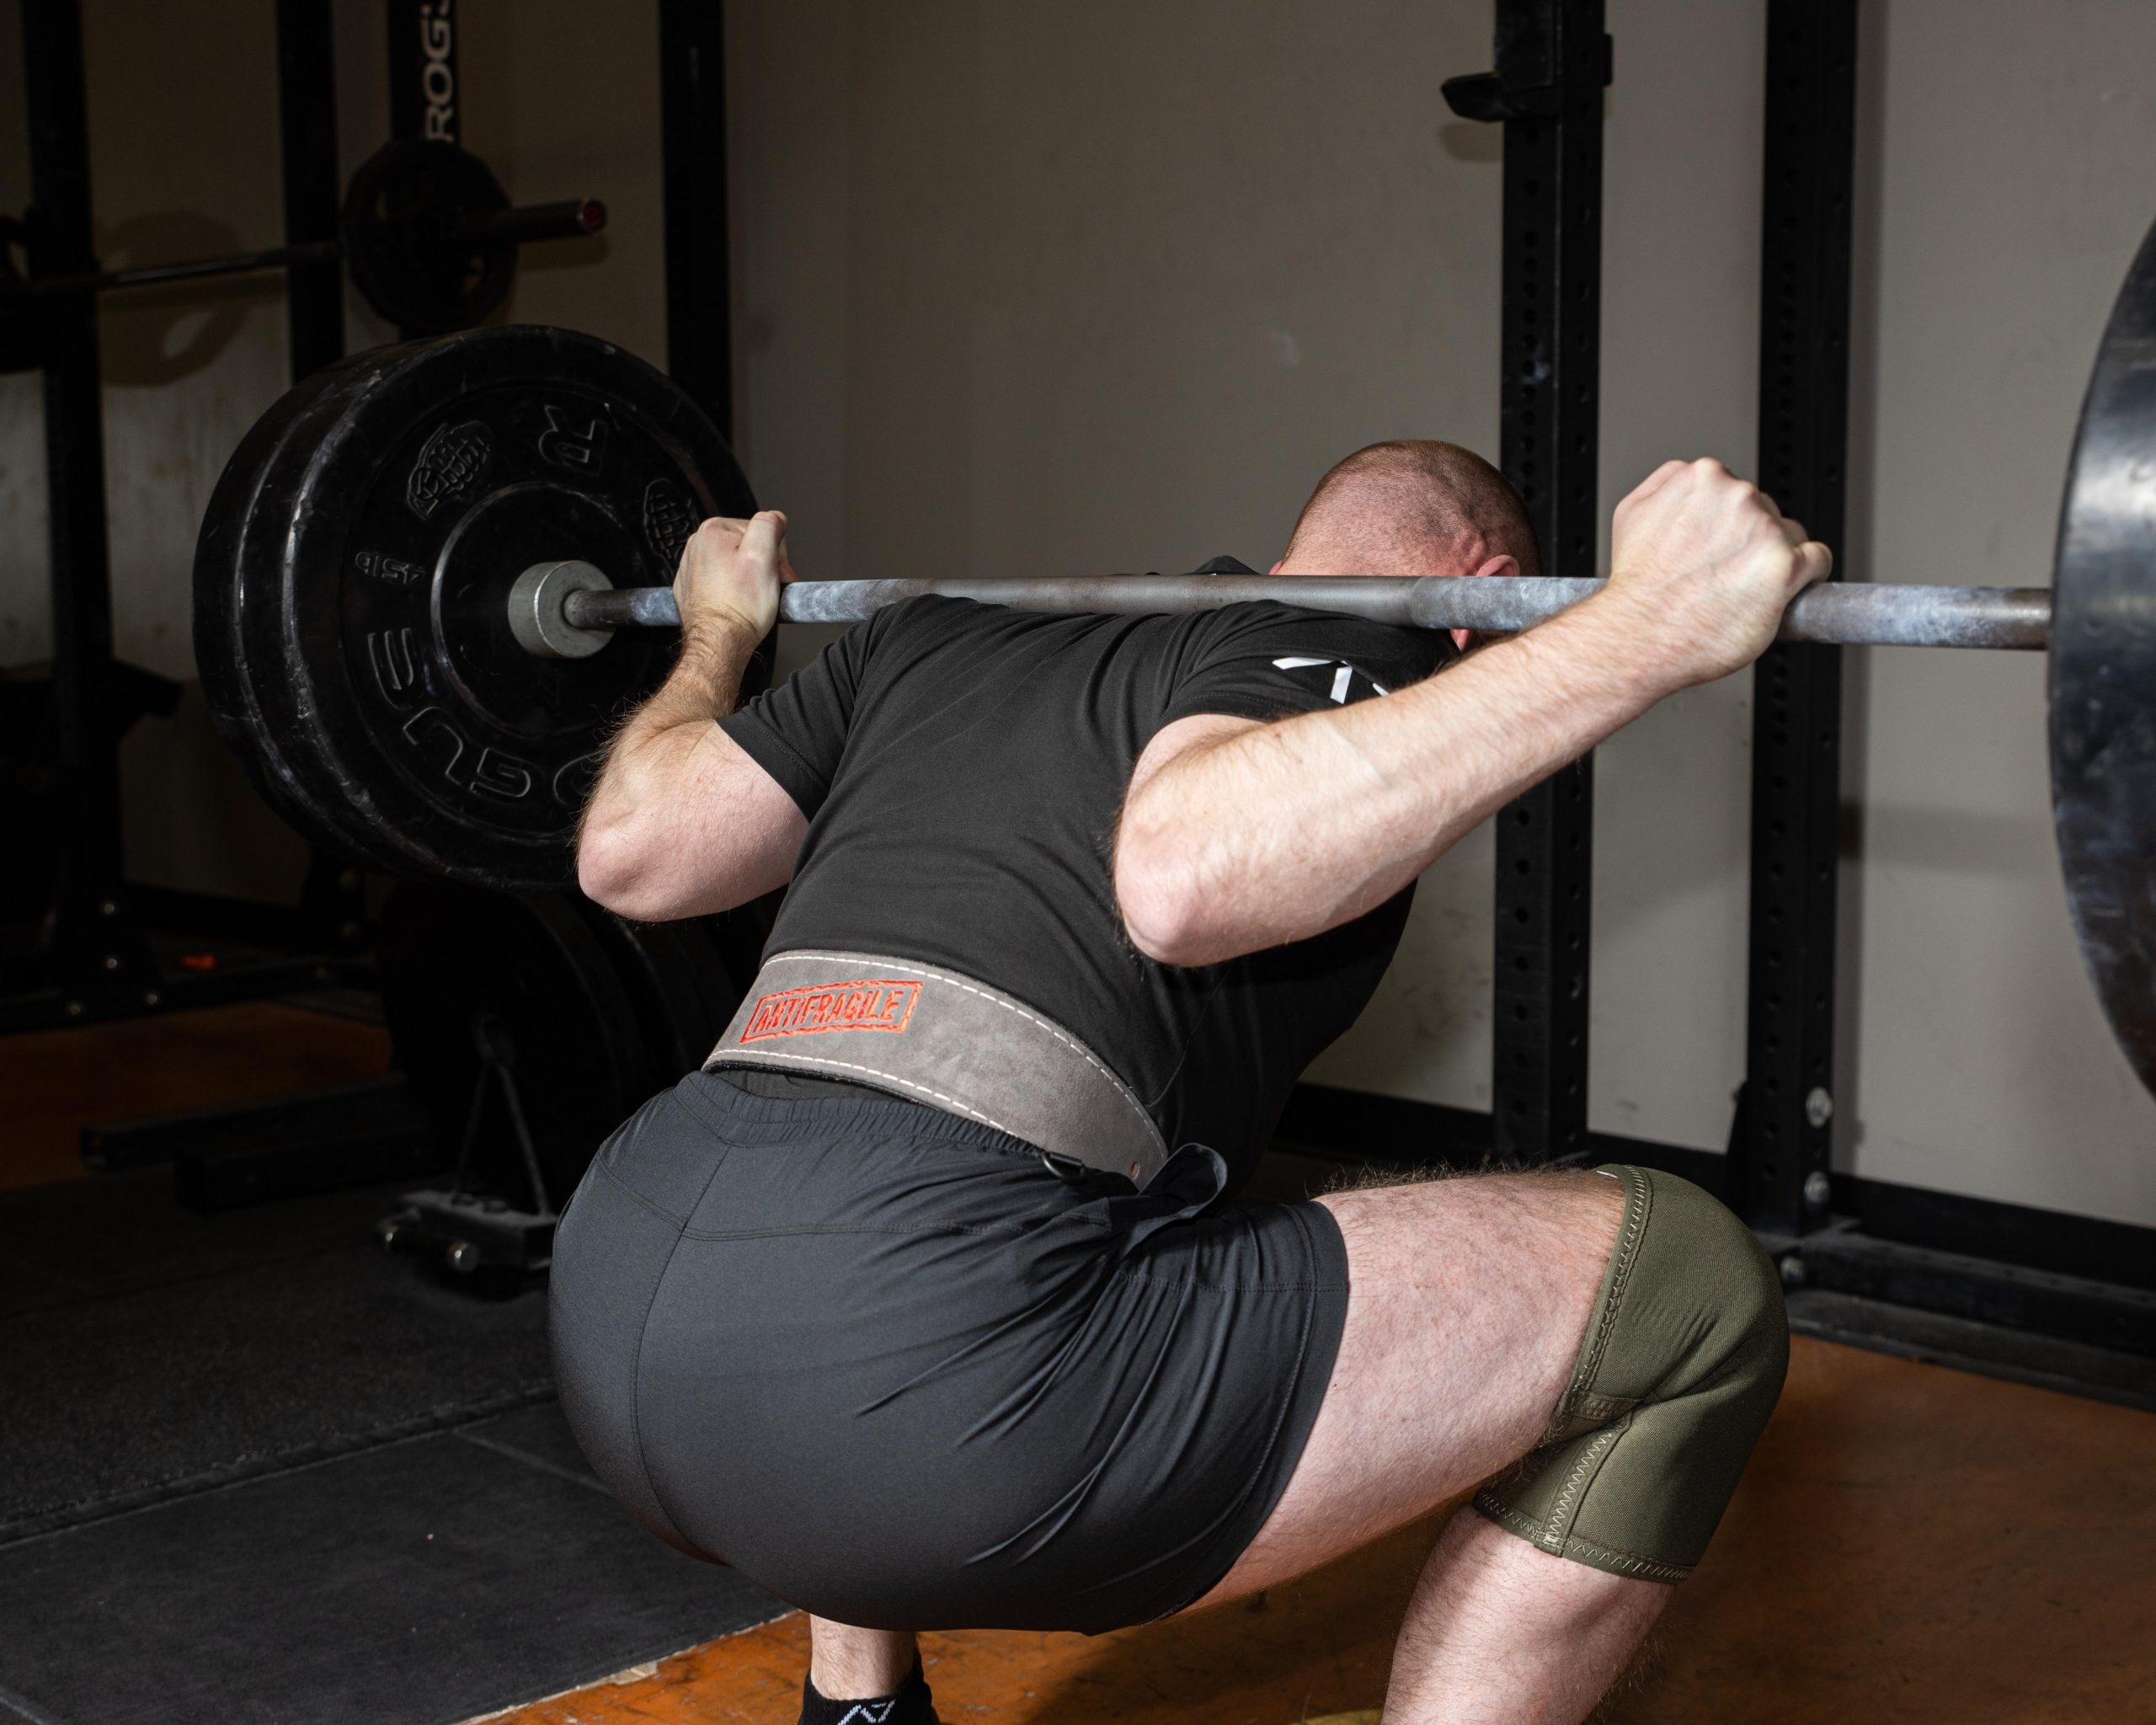 Robert Ordway lifting weights